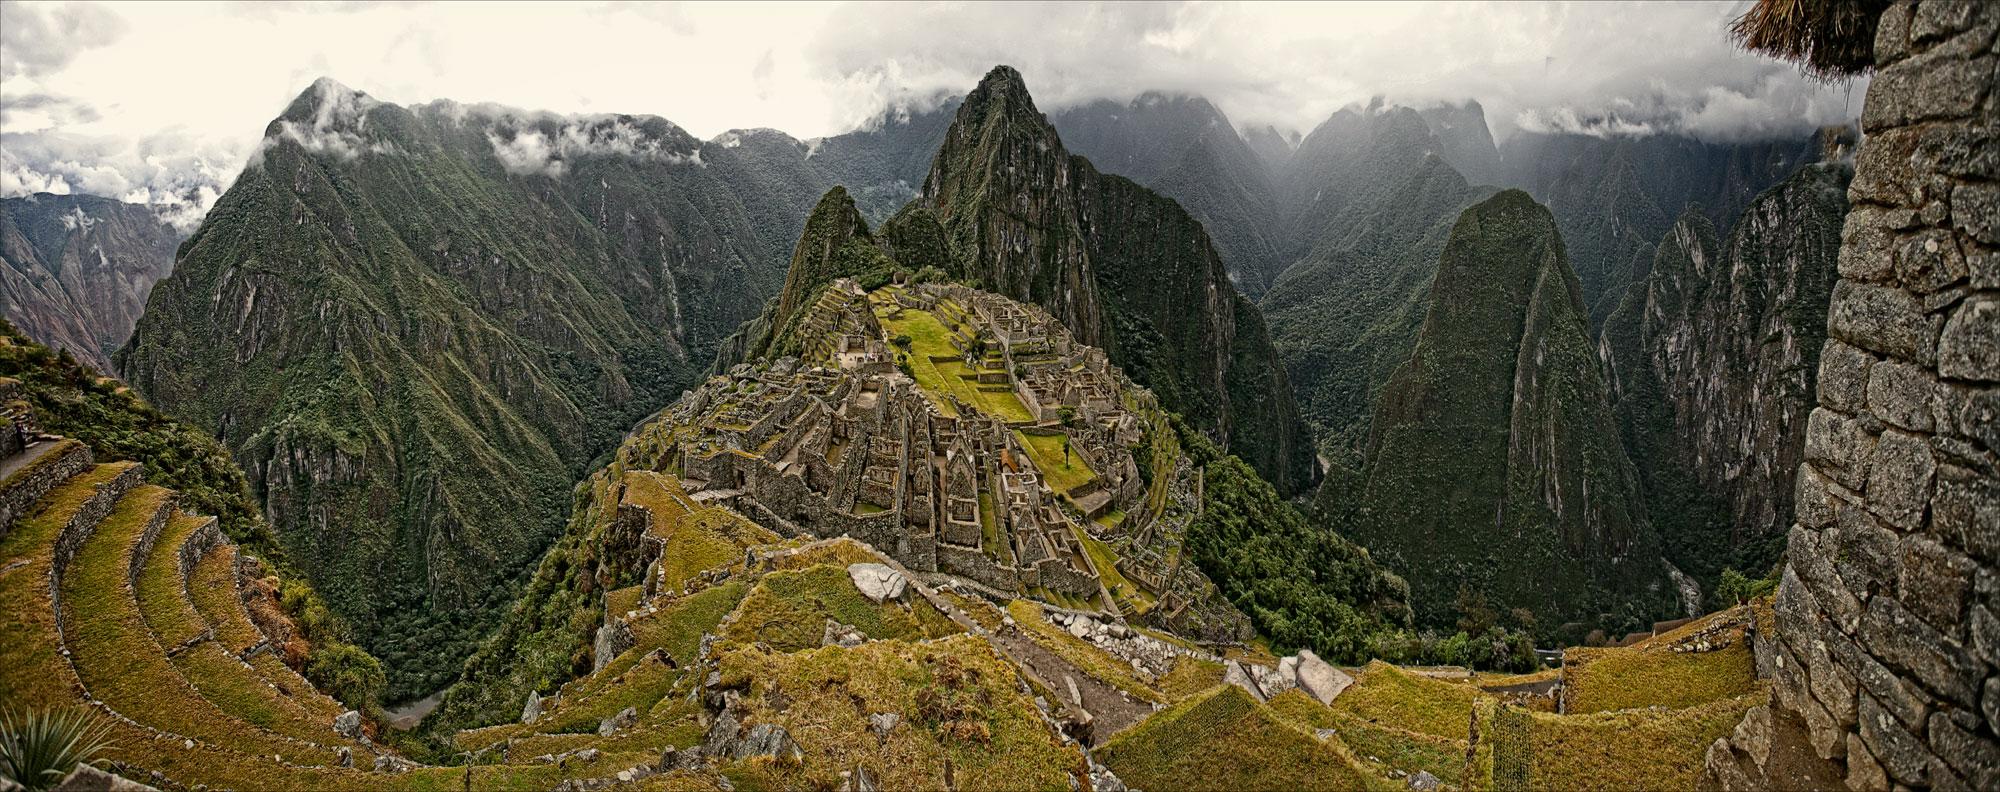 Machu Picchu and Guard House 2